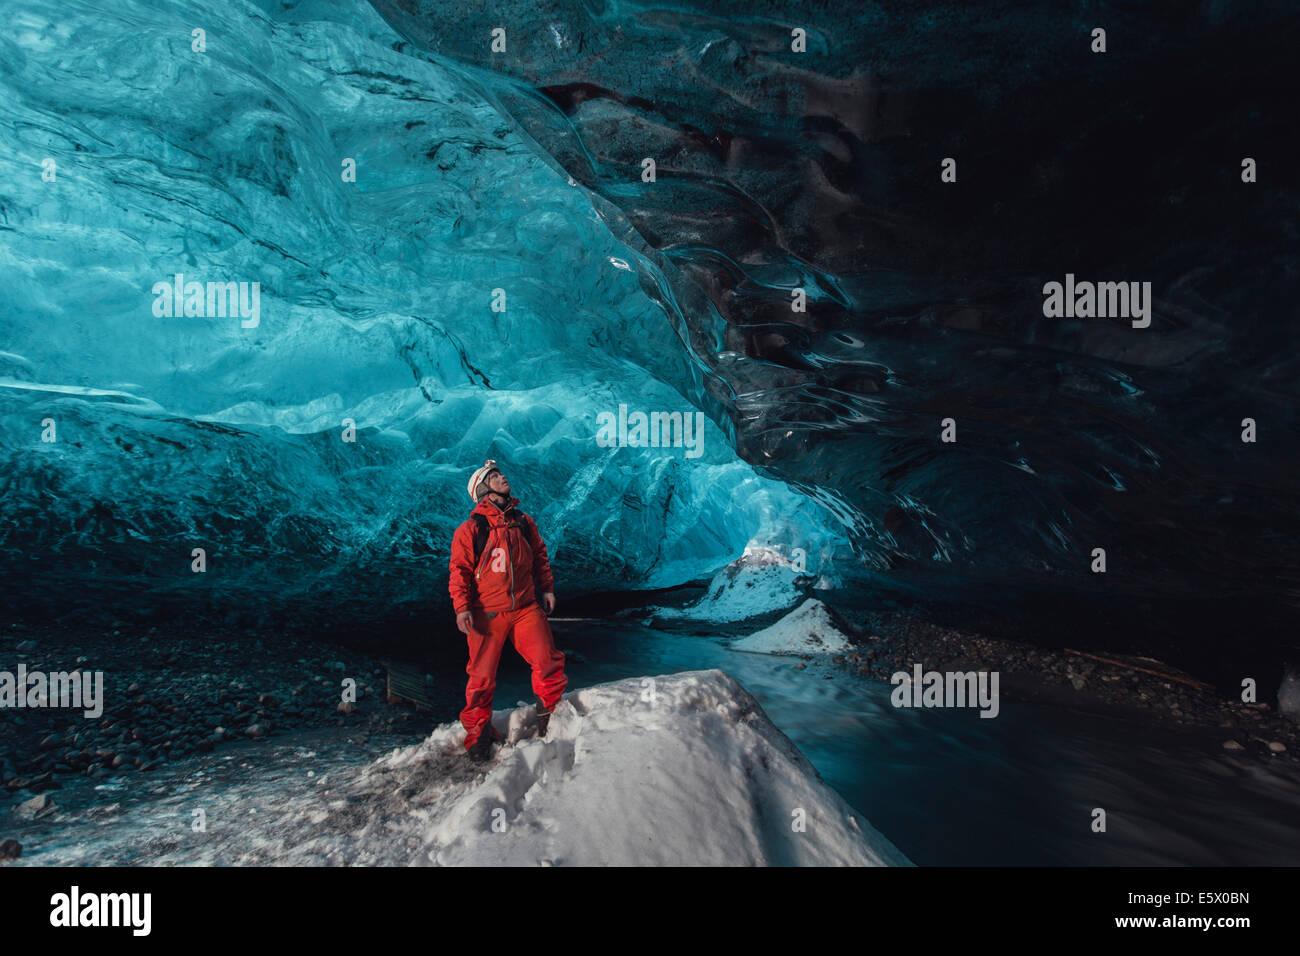 Man gazing upward in ice cave, Vatnajokull Glacier, Vatnajokull National Park, Iceland - Stock Image